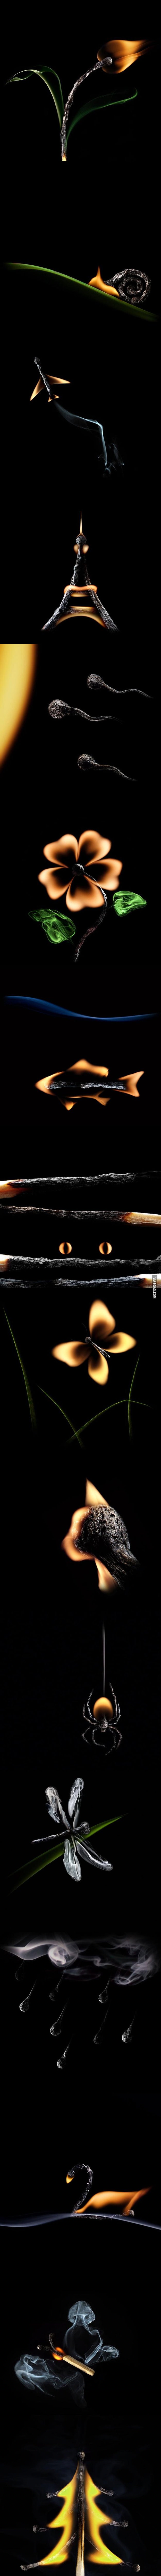 Amazing Burnt Matchstick Art